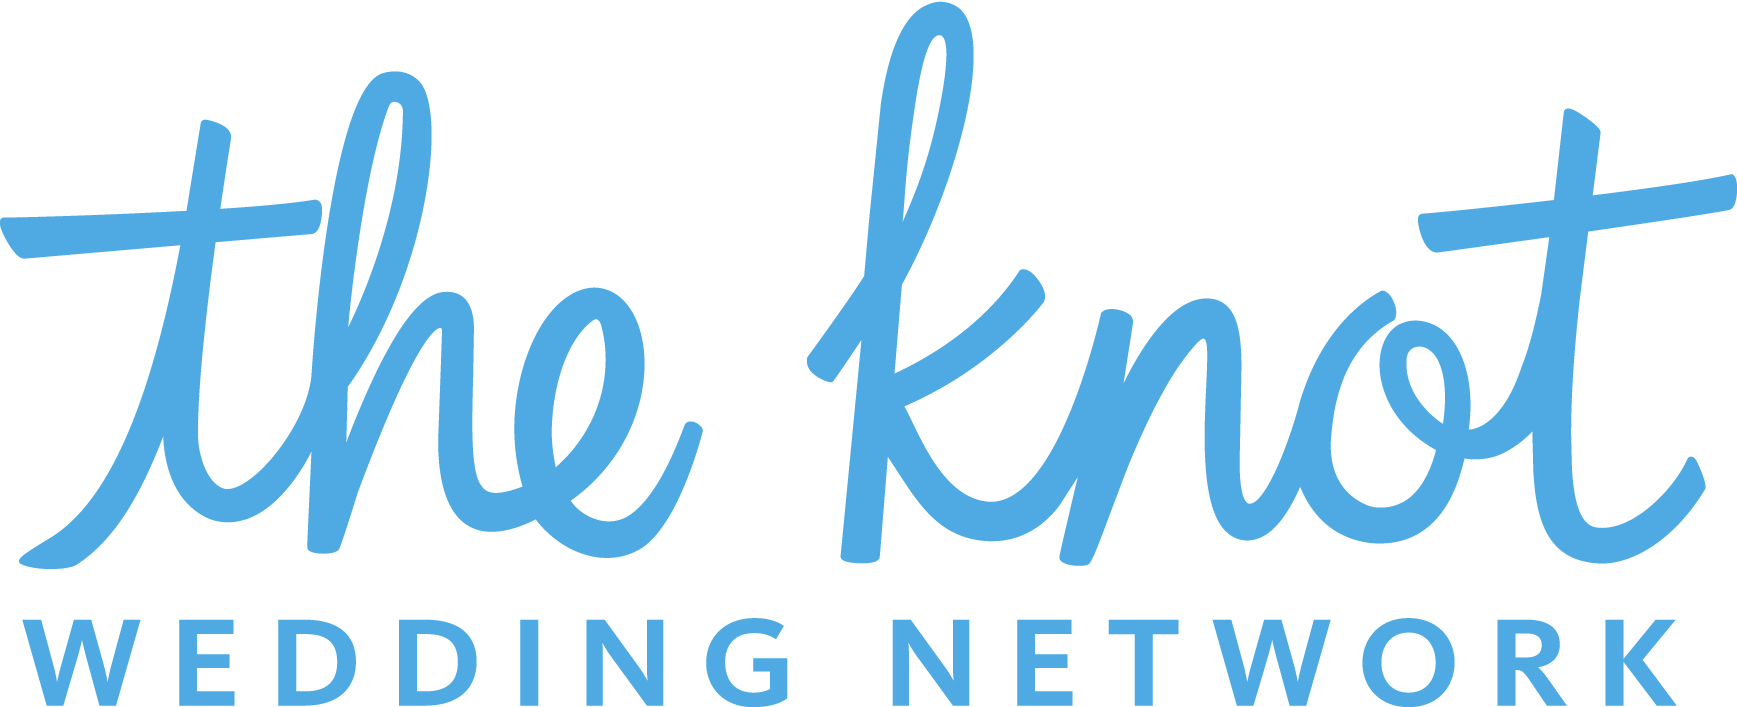 Knot_WeddingNetwork